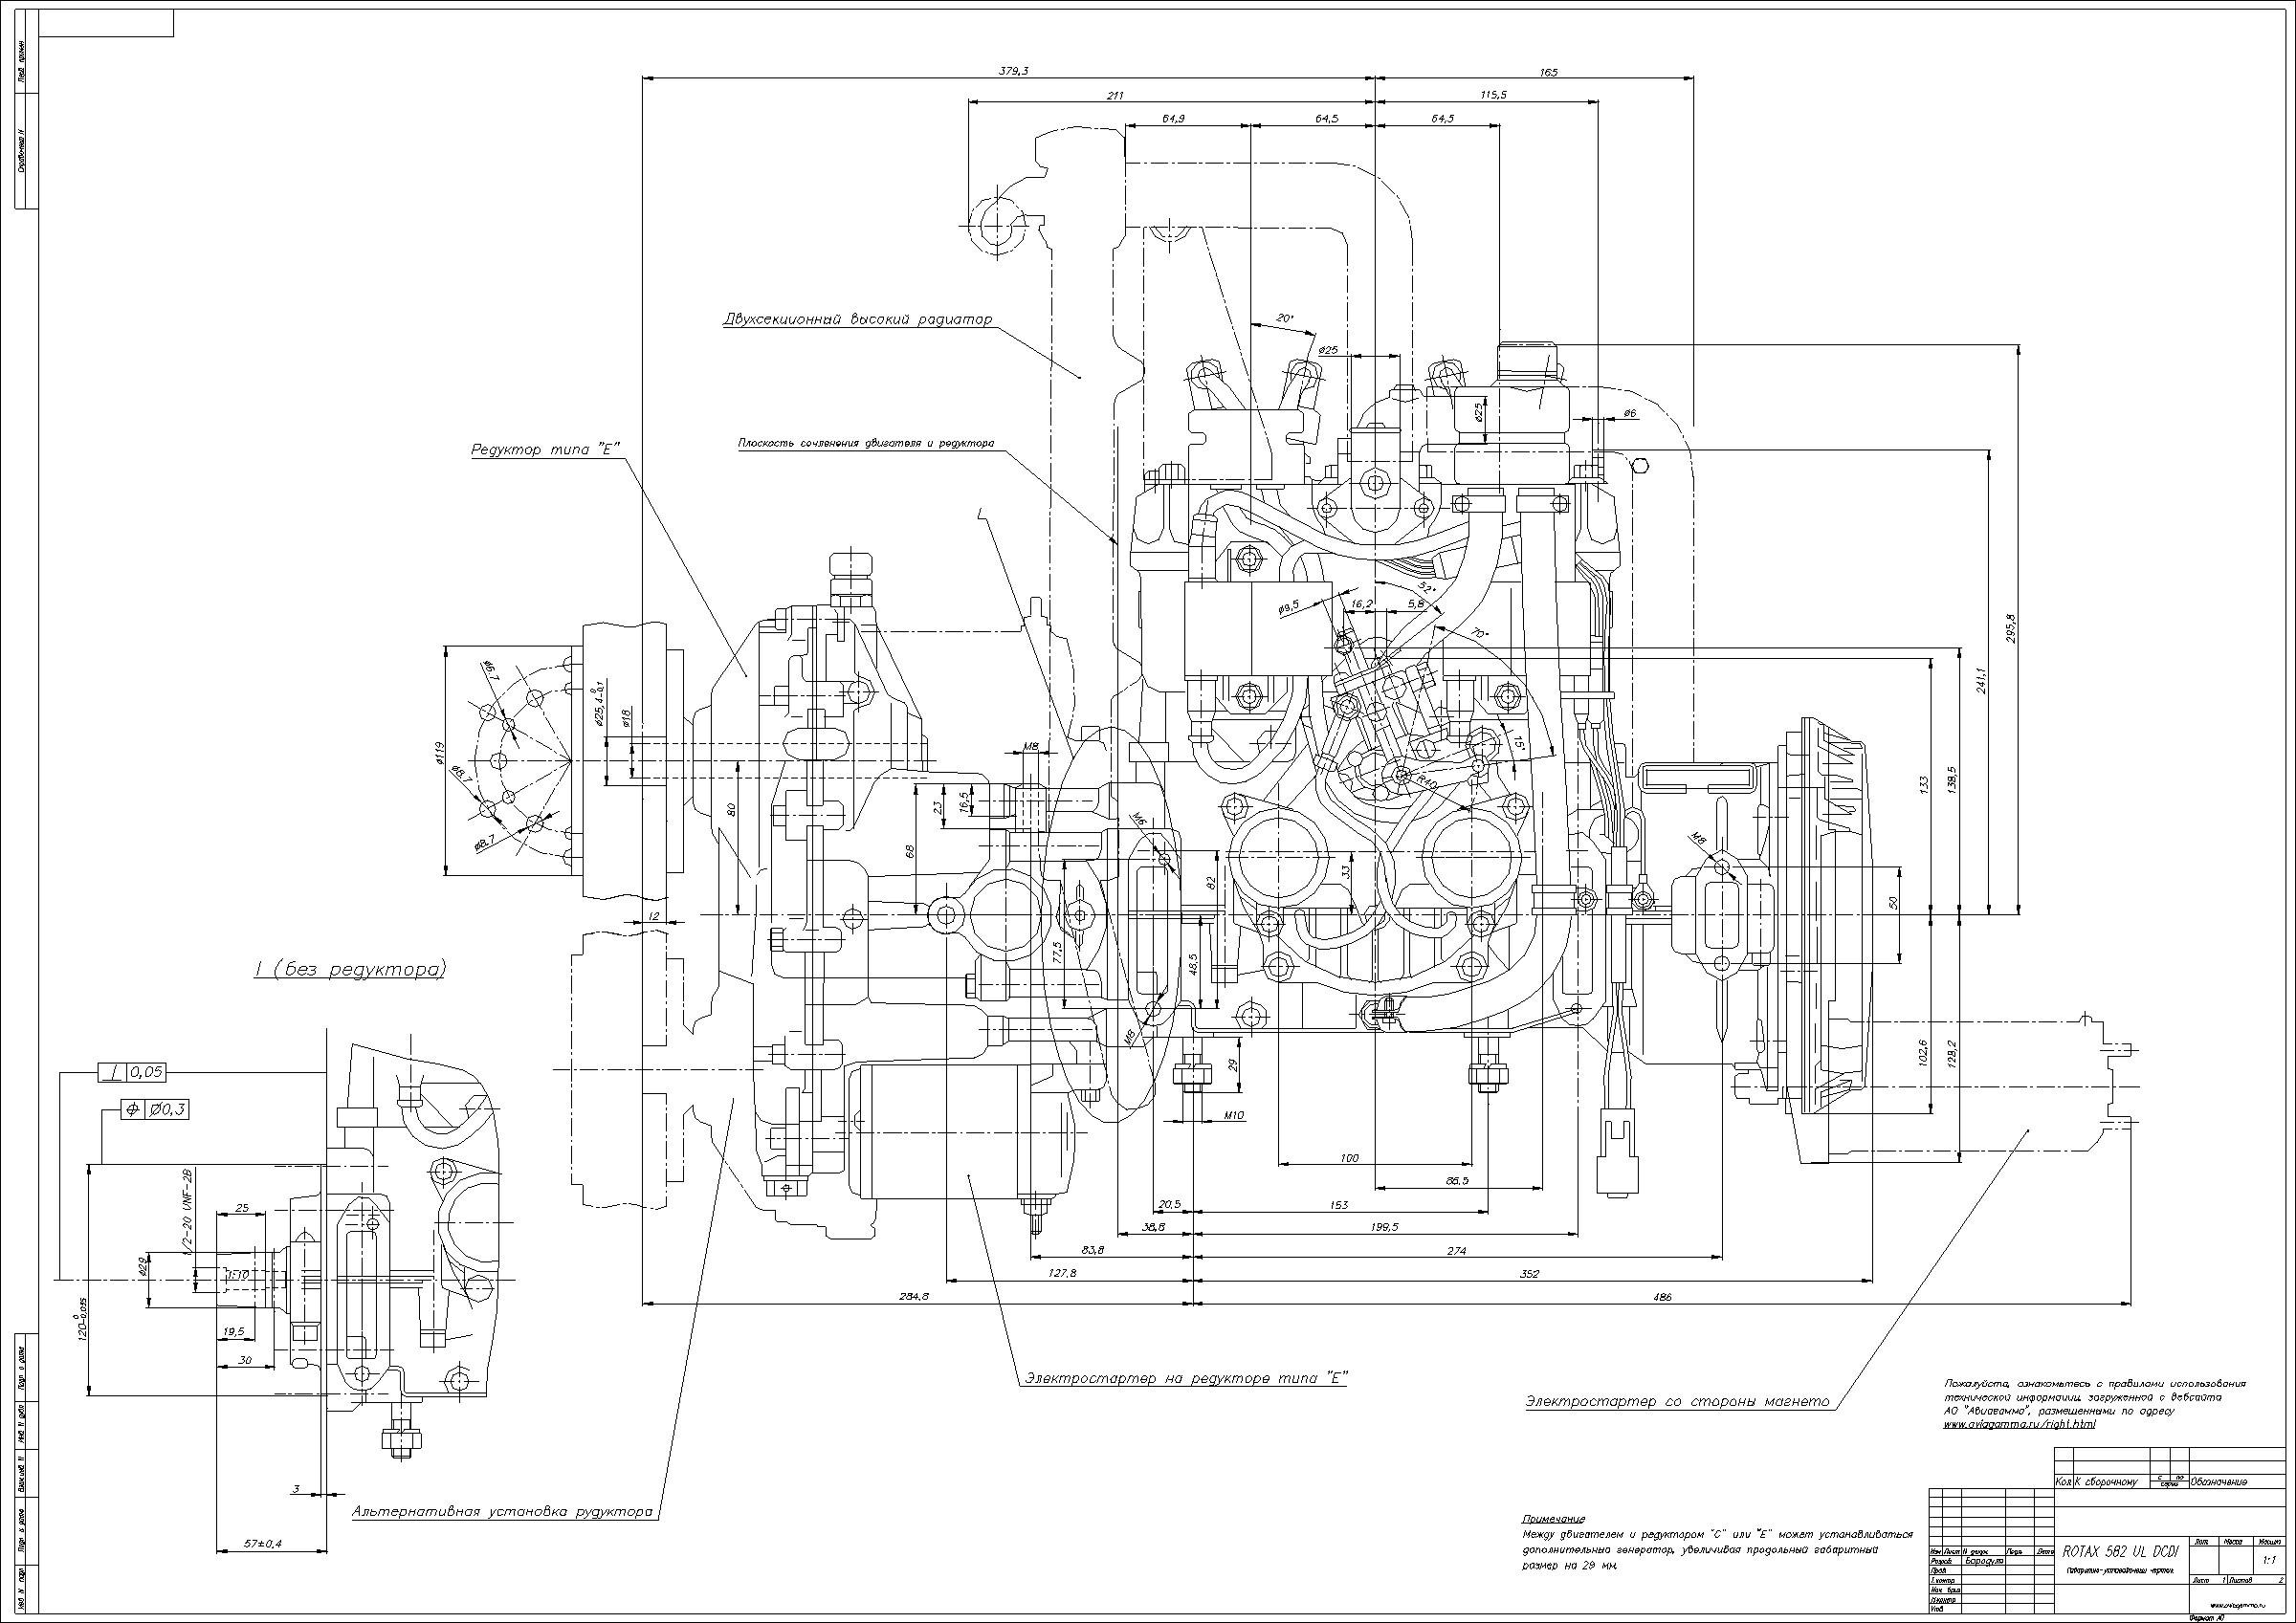 1965 Rotax 247 Wiring Diagram Rotax Engine Diagram Of 1965 Rotax 247 Wiring Diagram